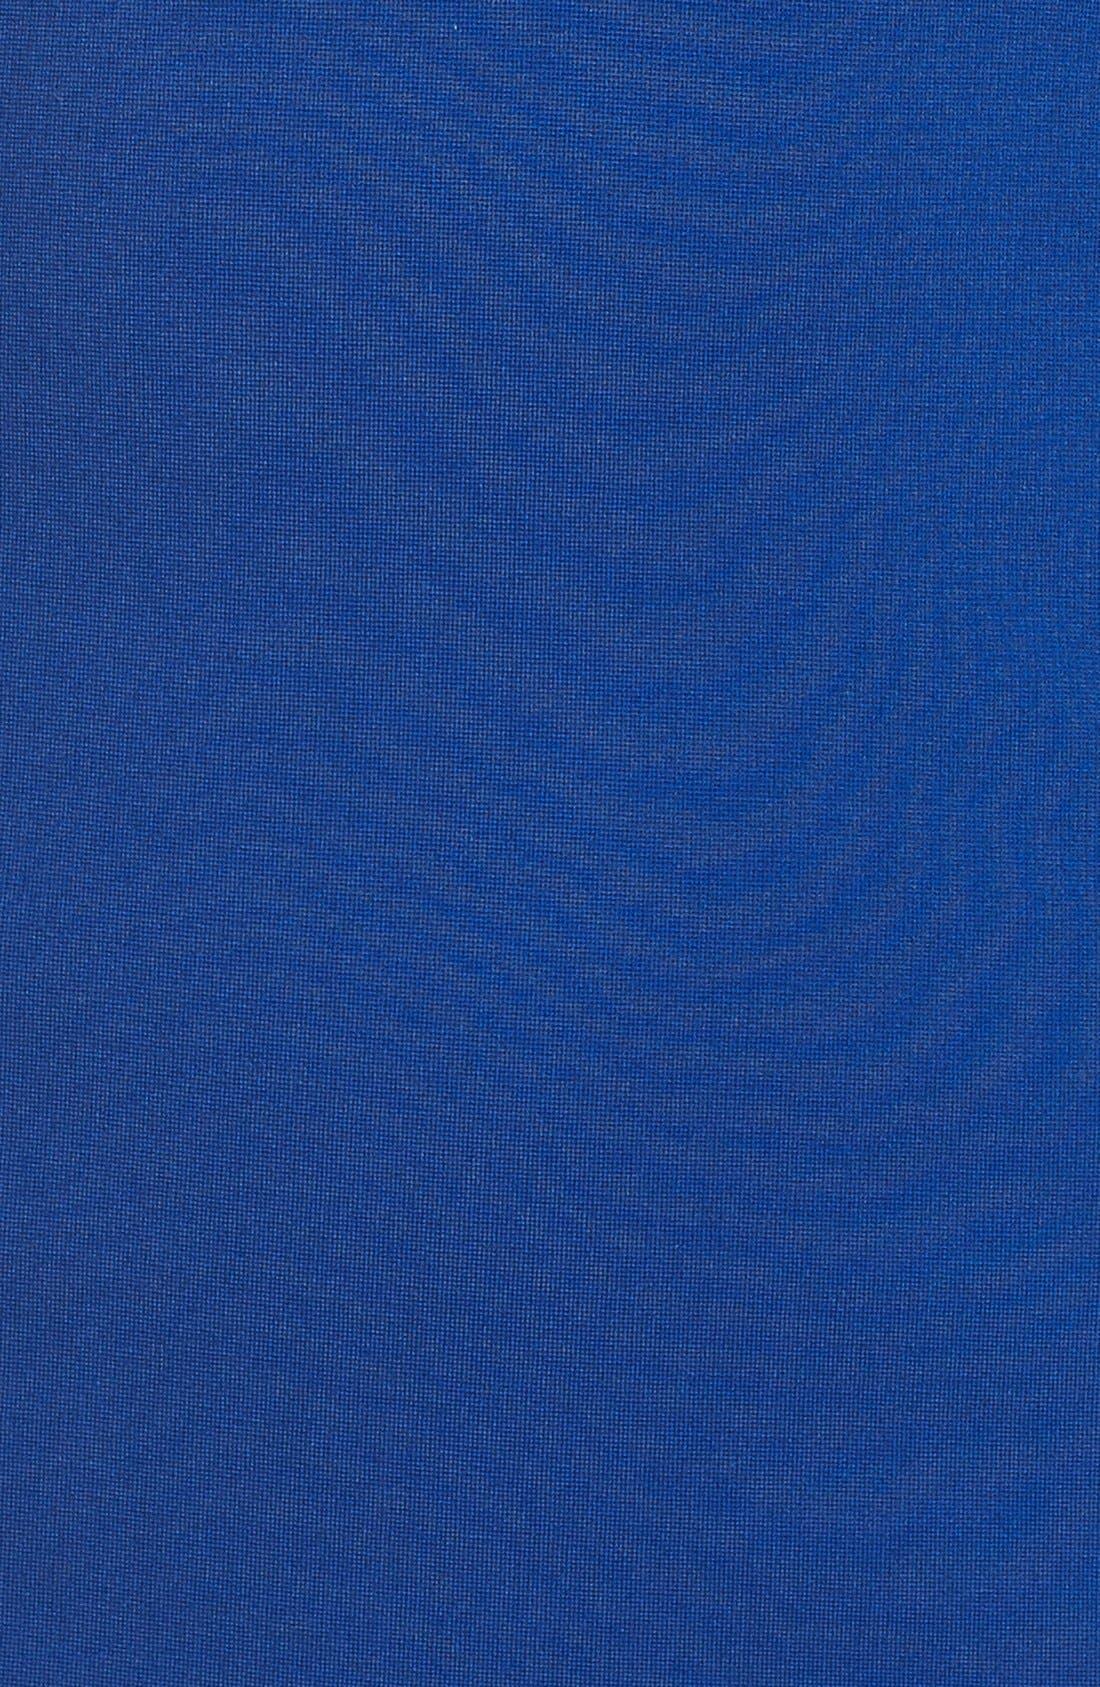 Alternate Image 5  - Felicity & Coco V-Neck Ponte Knit Midi Sheath Dress (Regular & Petite) (Nordstrom Exclusive)